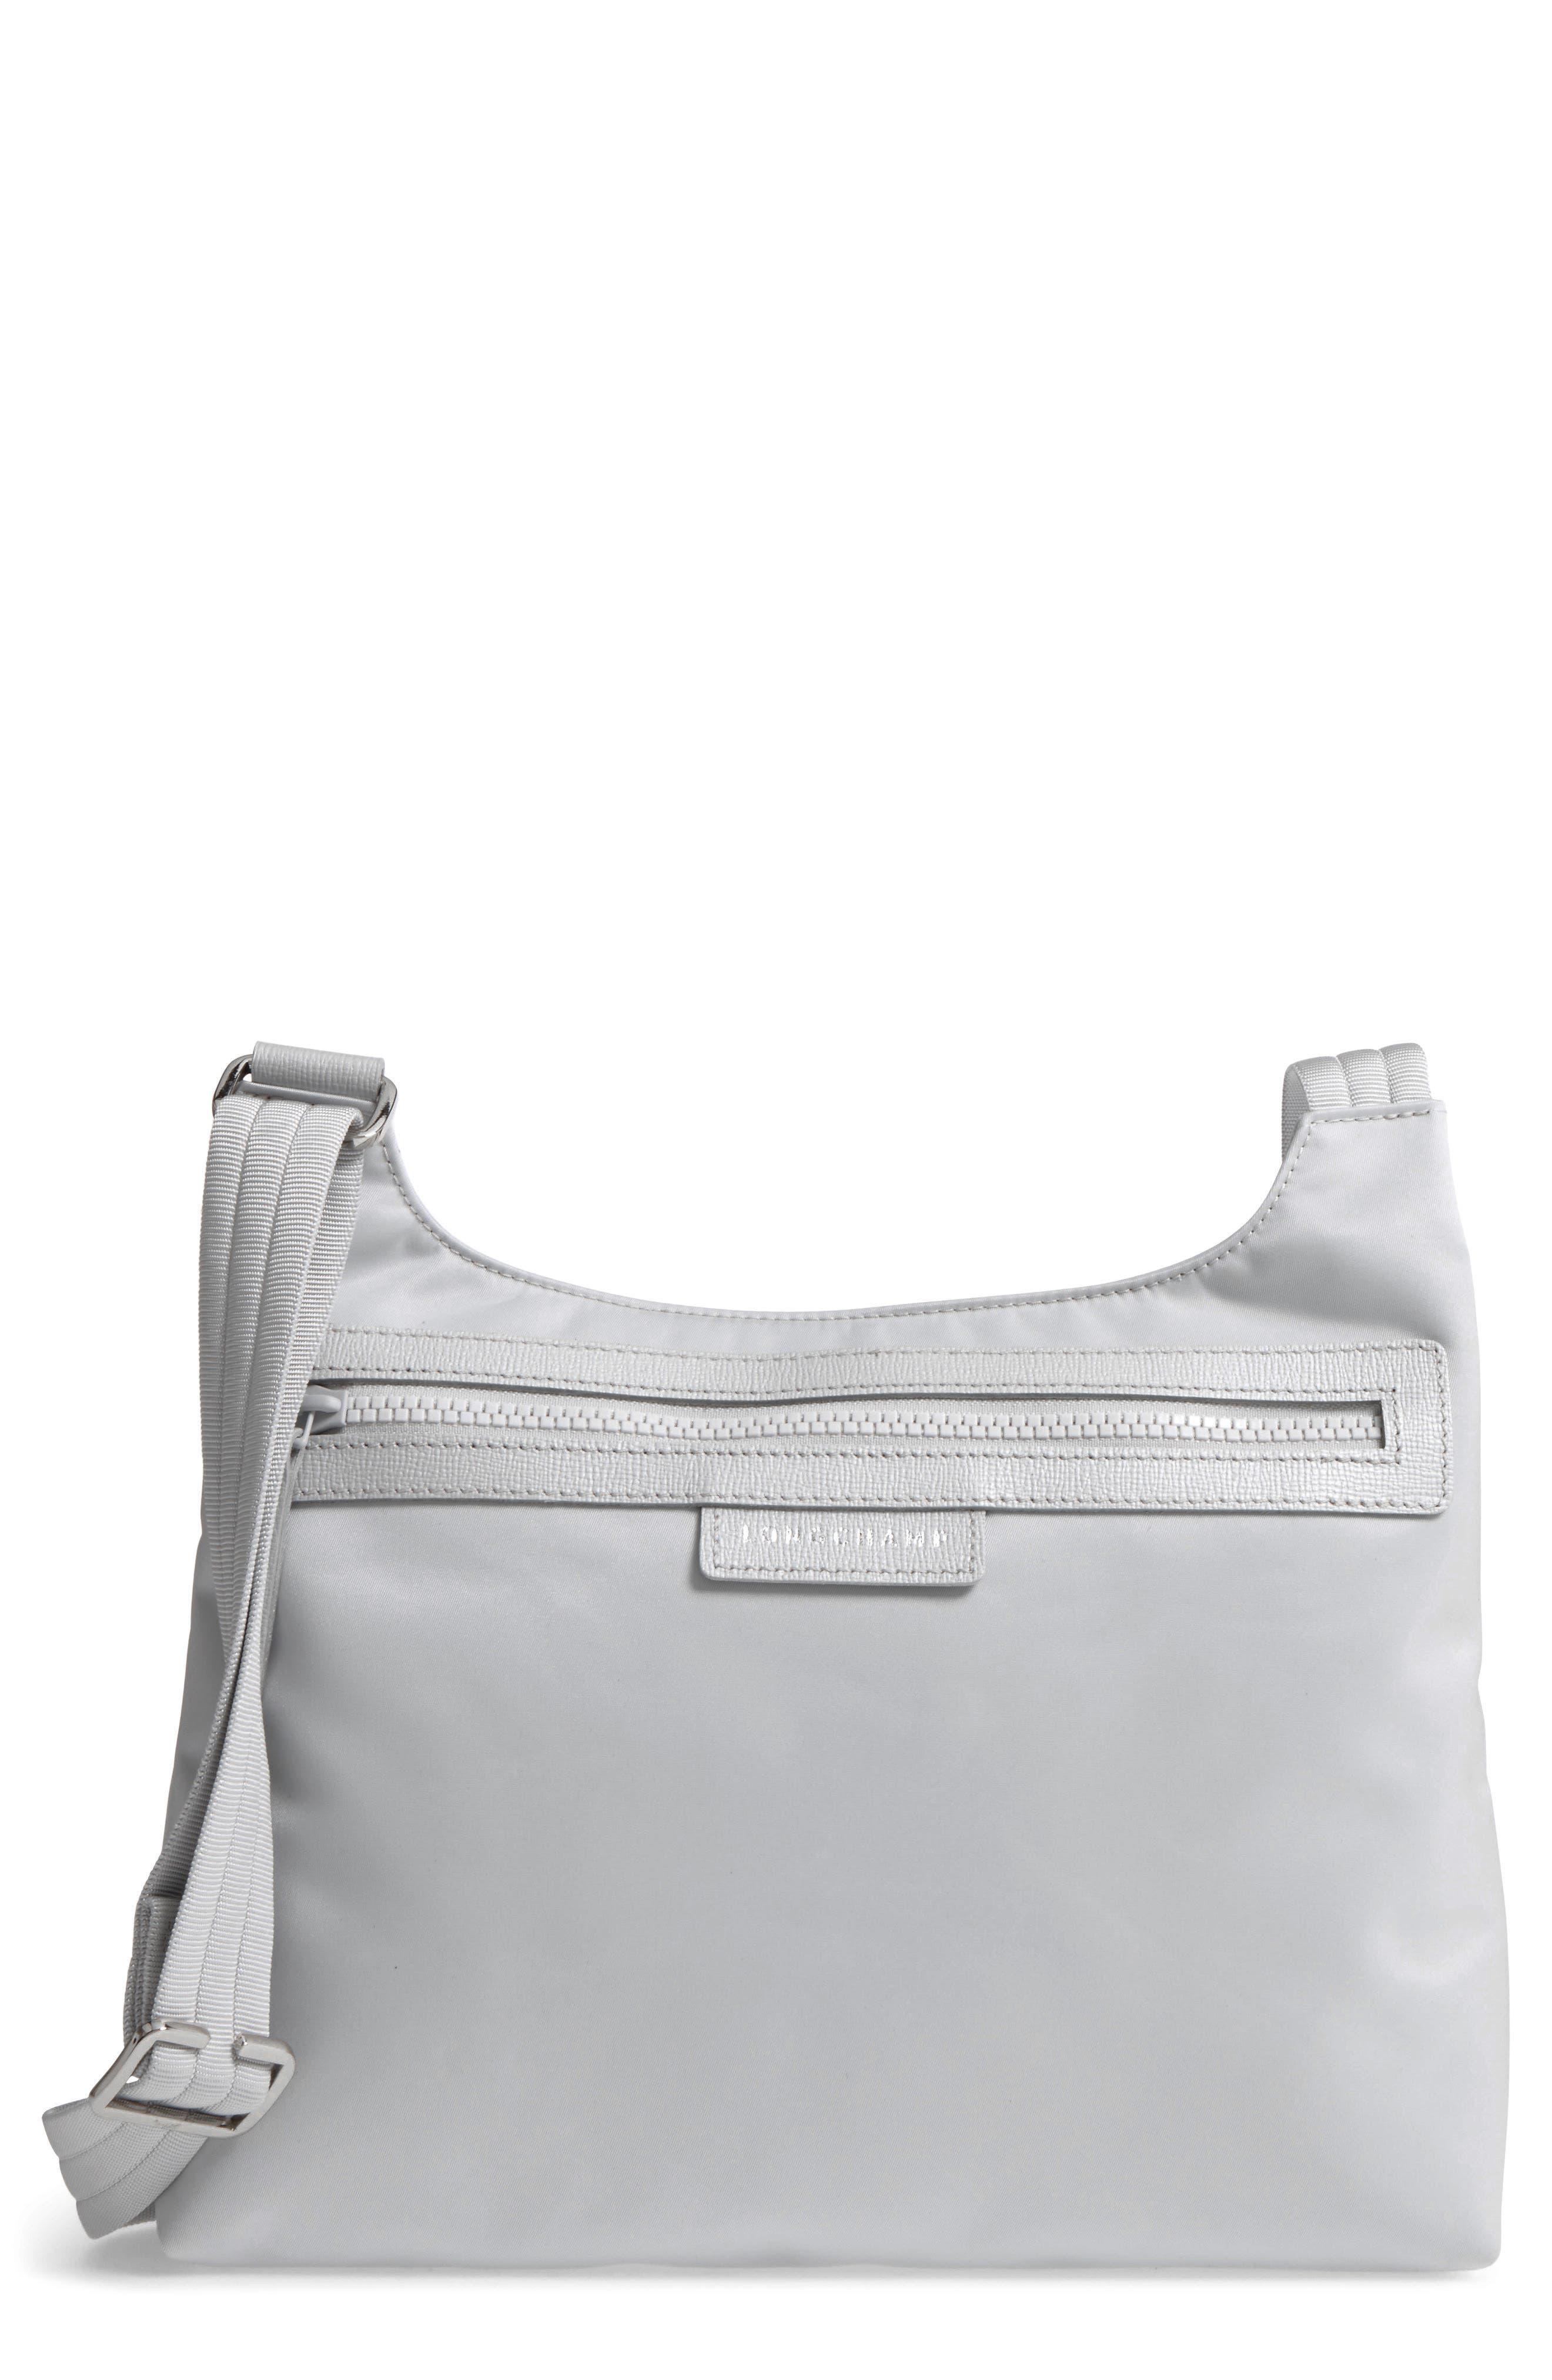 Longchamp Le Pliage Neo Nylon Crossbody Bag Metallic In Silver Medium Black Authentic